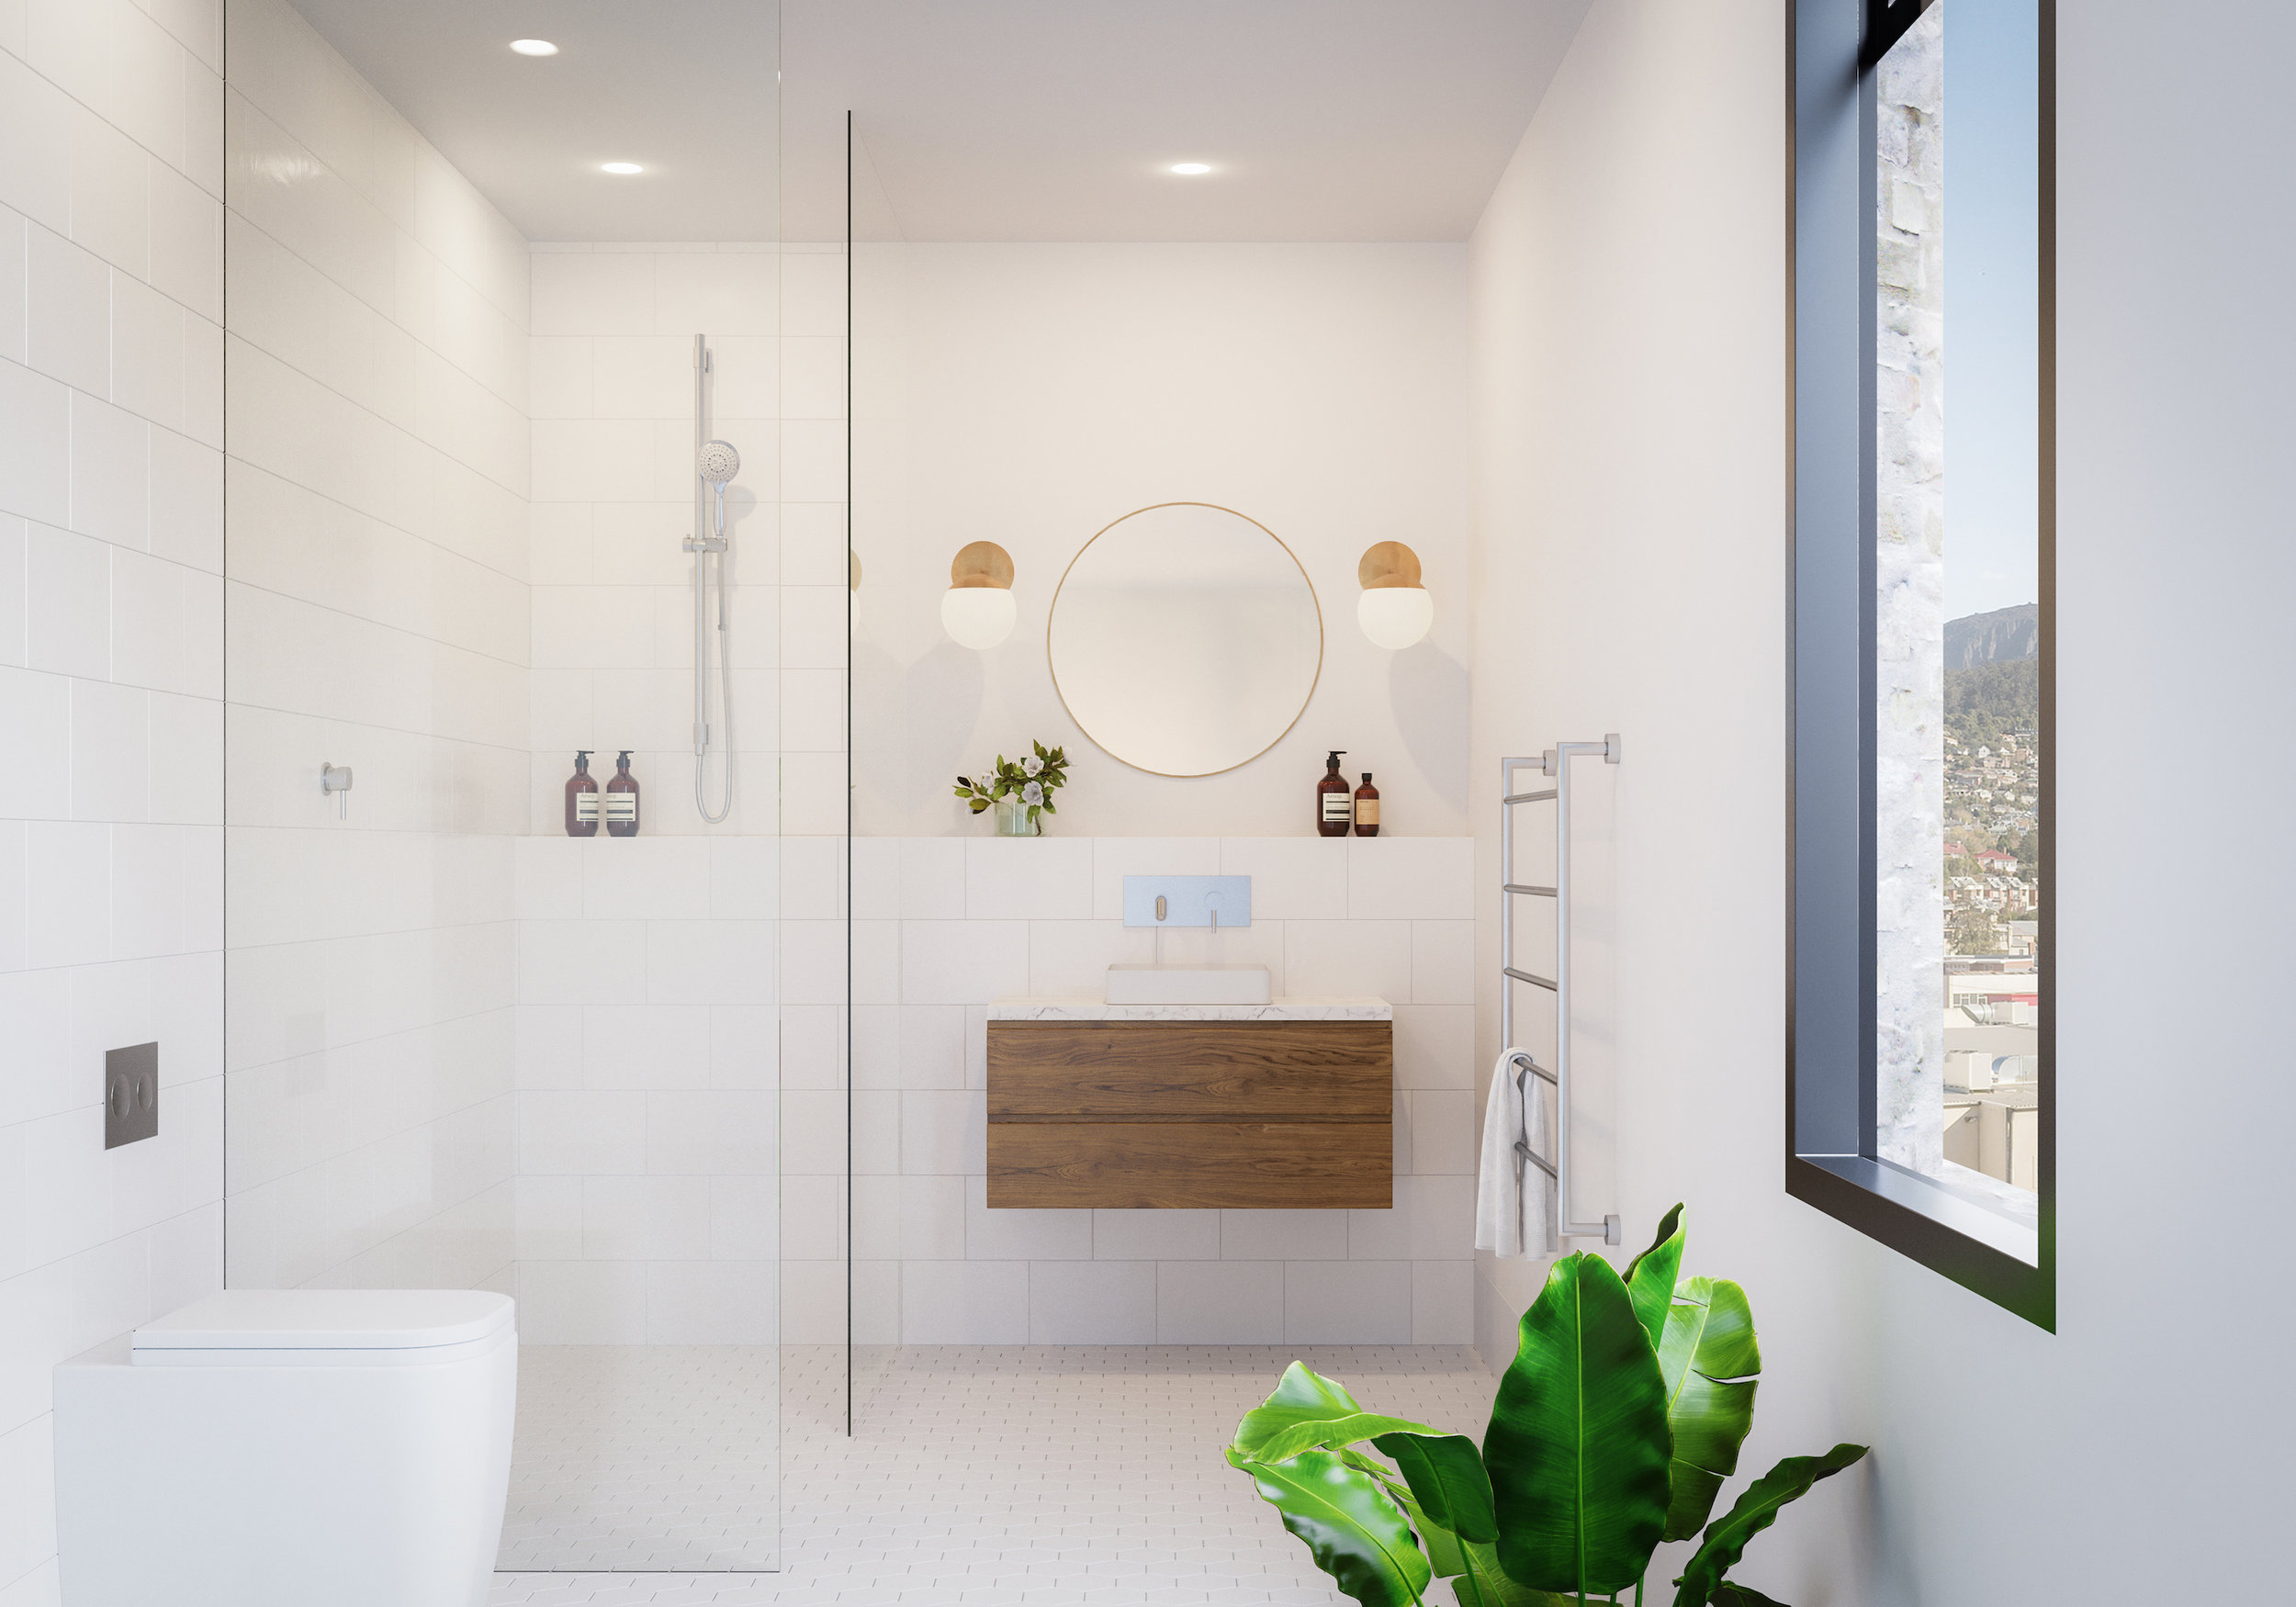 s00049_V04 Bathroom_180803_Final-lr.jpeg